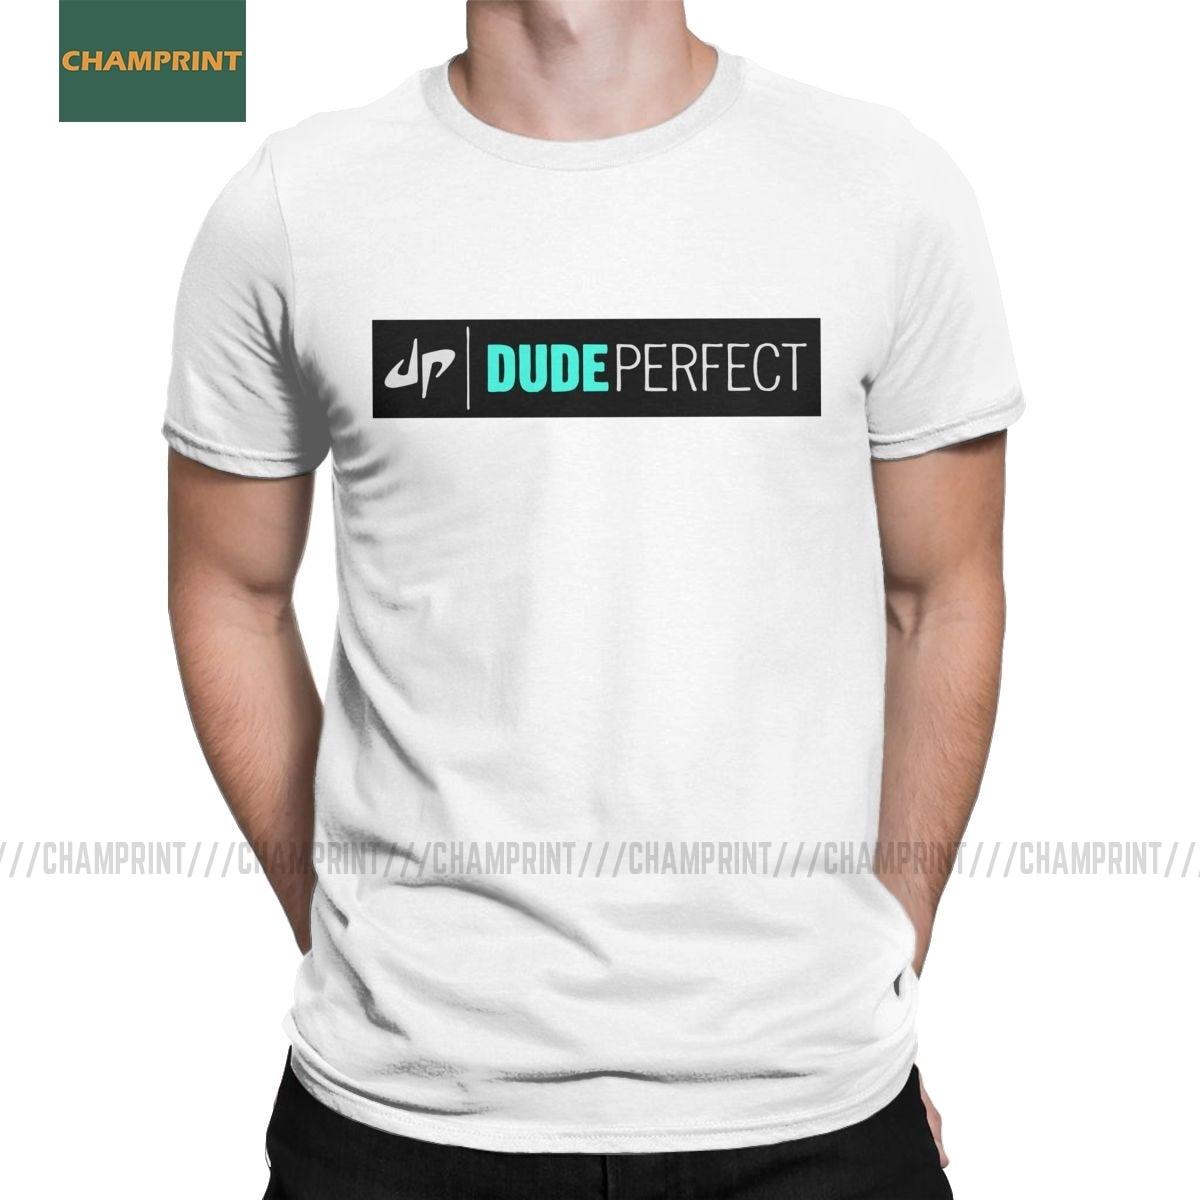 Relevanten Geck Perfekte T-Shirts für Männer Trend Tyler Coby Cory Cod Sportliche Youtube Vlog Baumwolle Tees Kurzarm T hemd